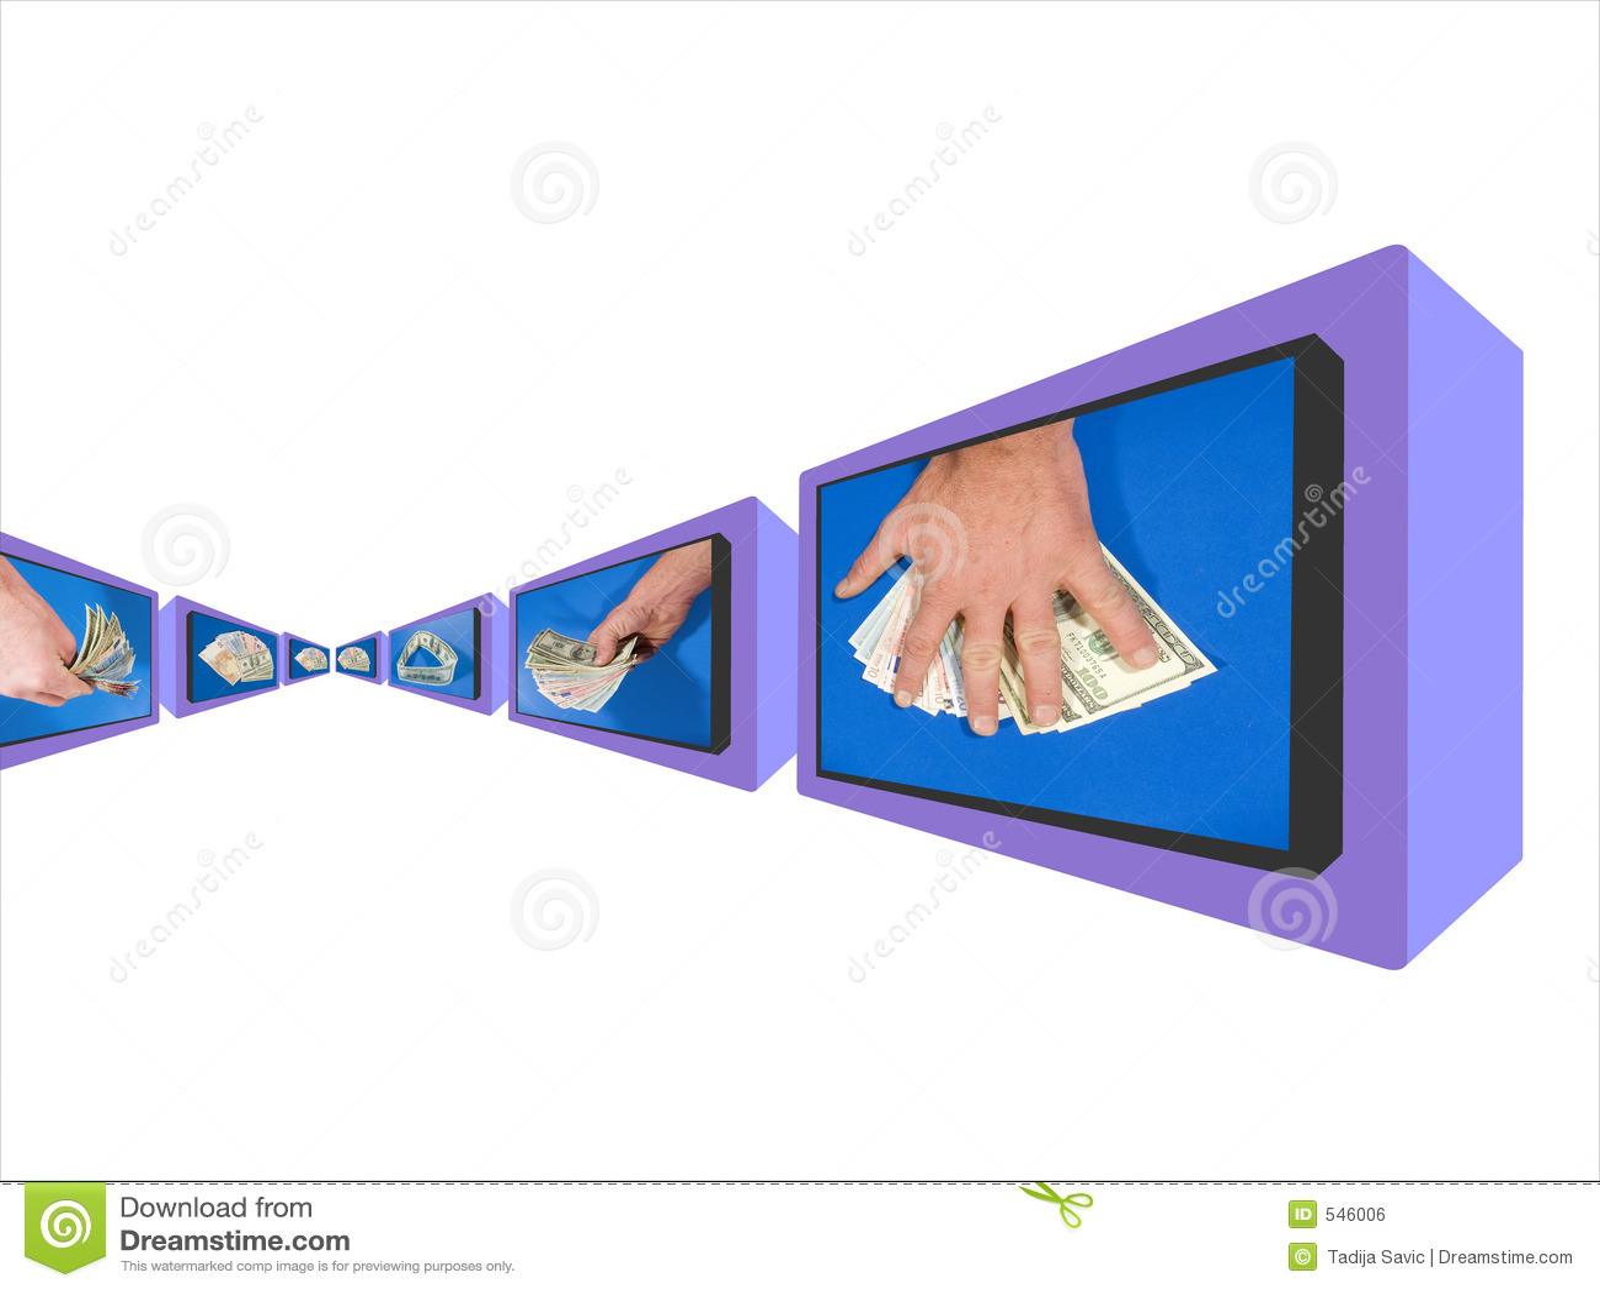 Download 货币监控程序 库存例证. 插画 包括有 股票, 货币, 监控程序, 附注, 颜色, 办公室, 美元, 状态, 替换 - 546006